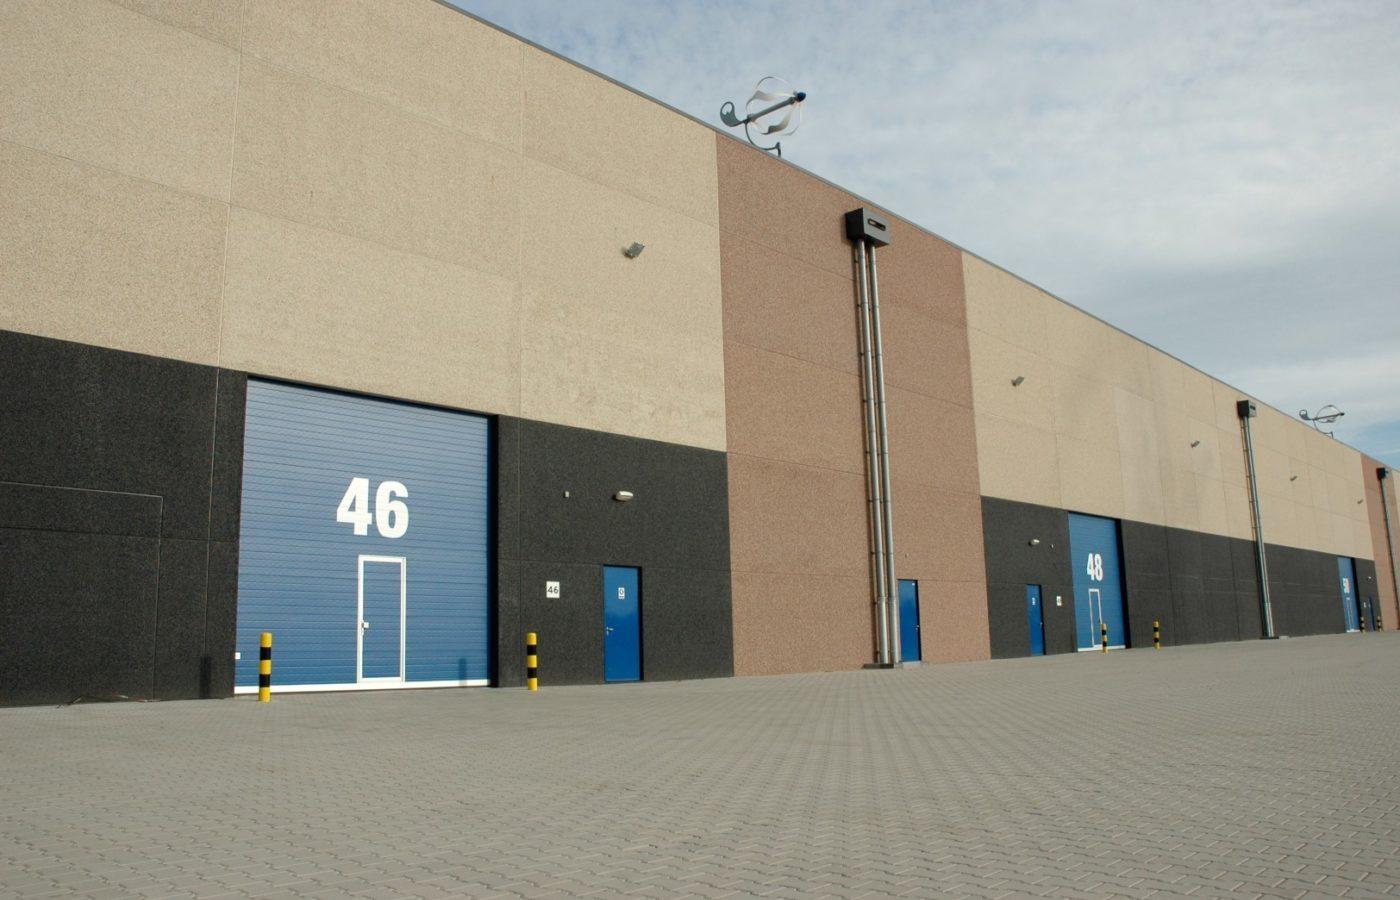 6.-Commodity-Park-Rotterdam-Large.JPG